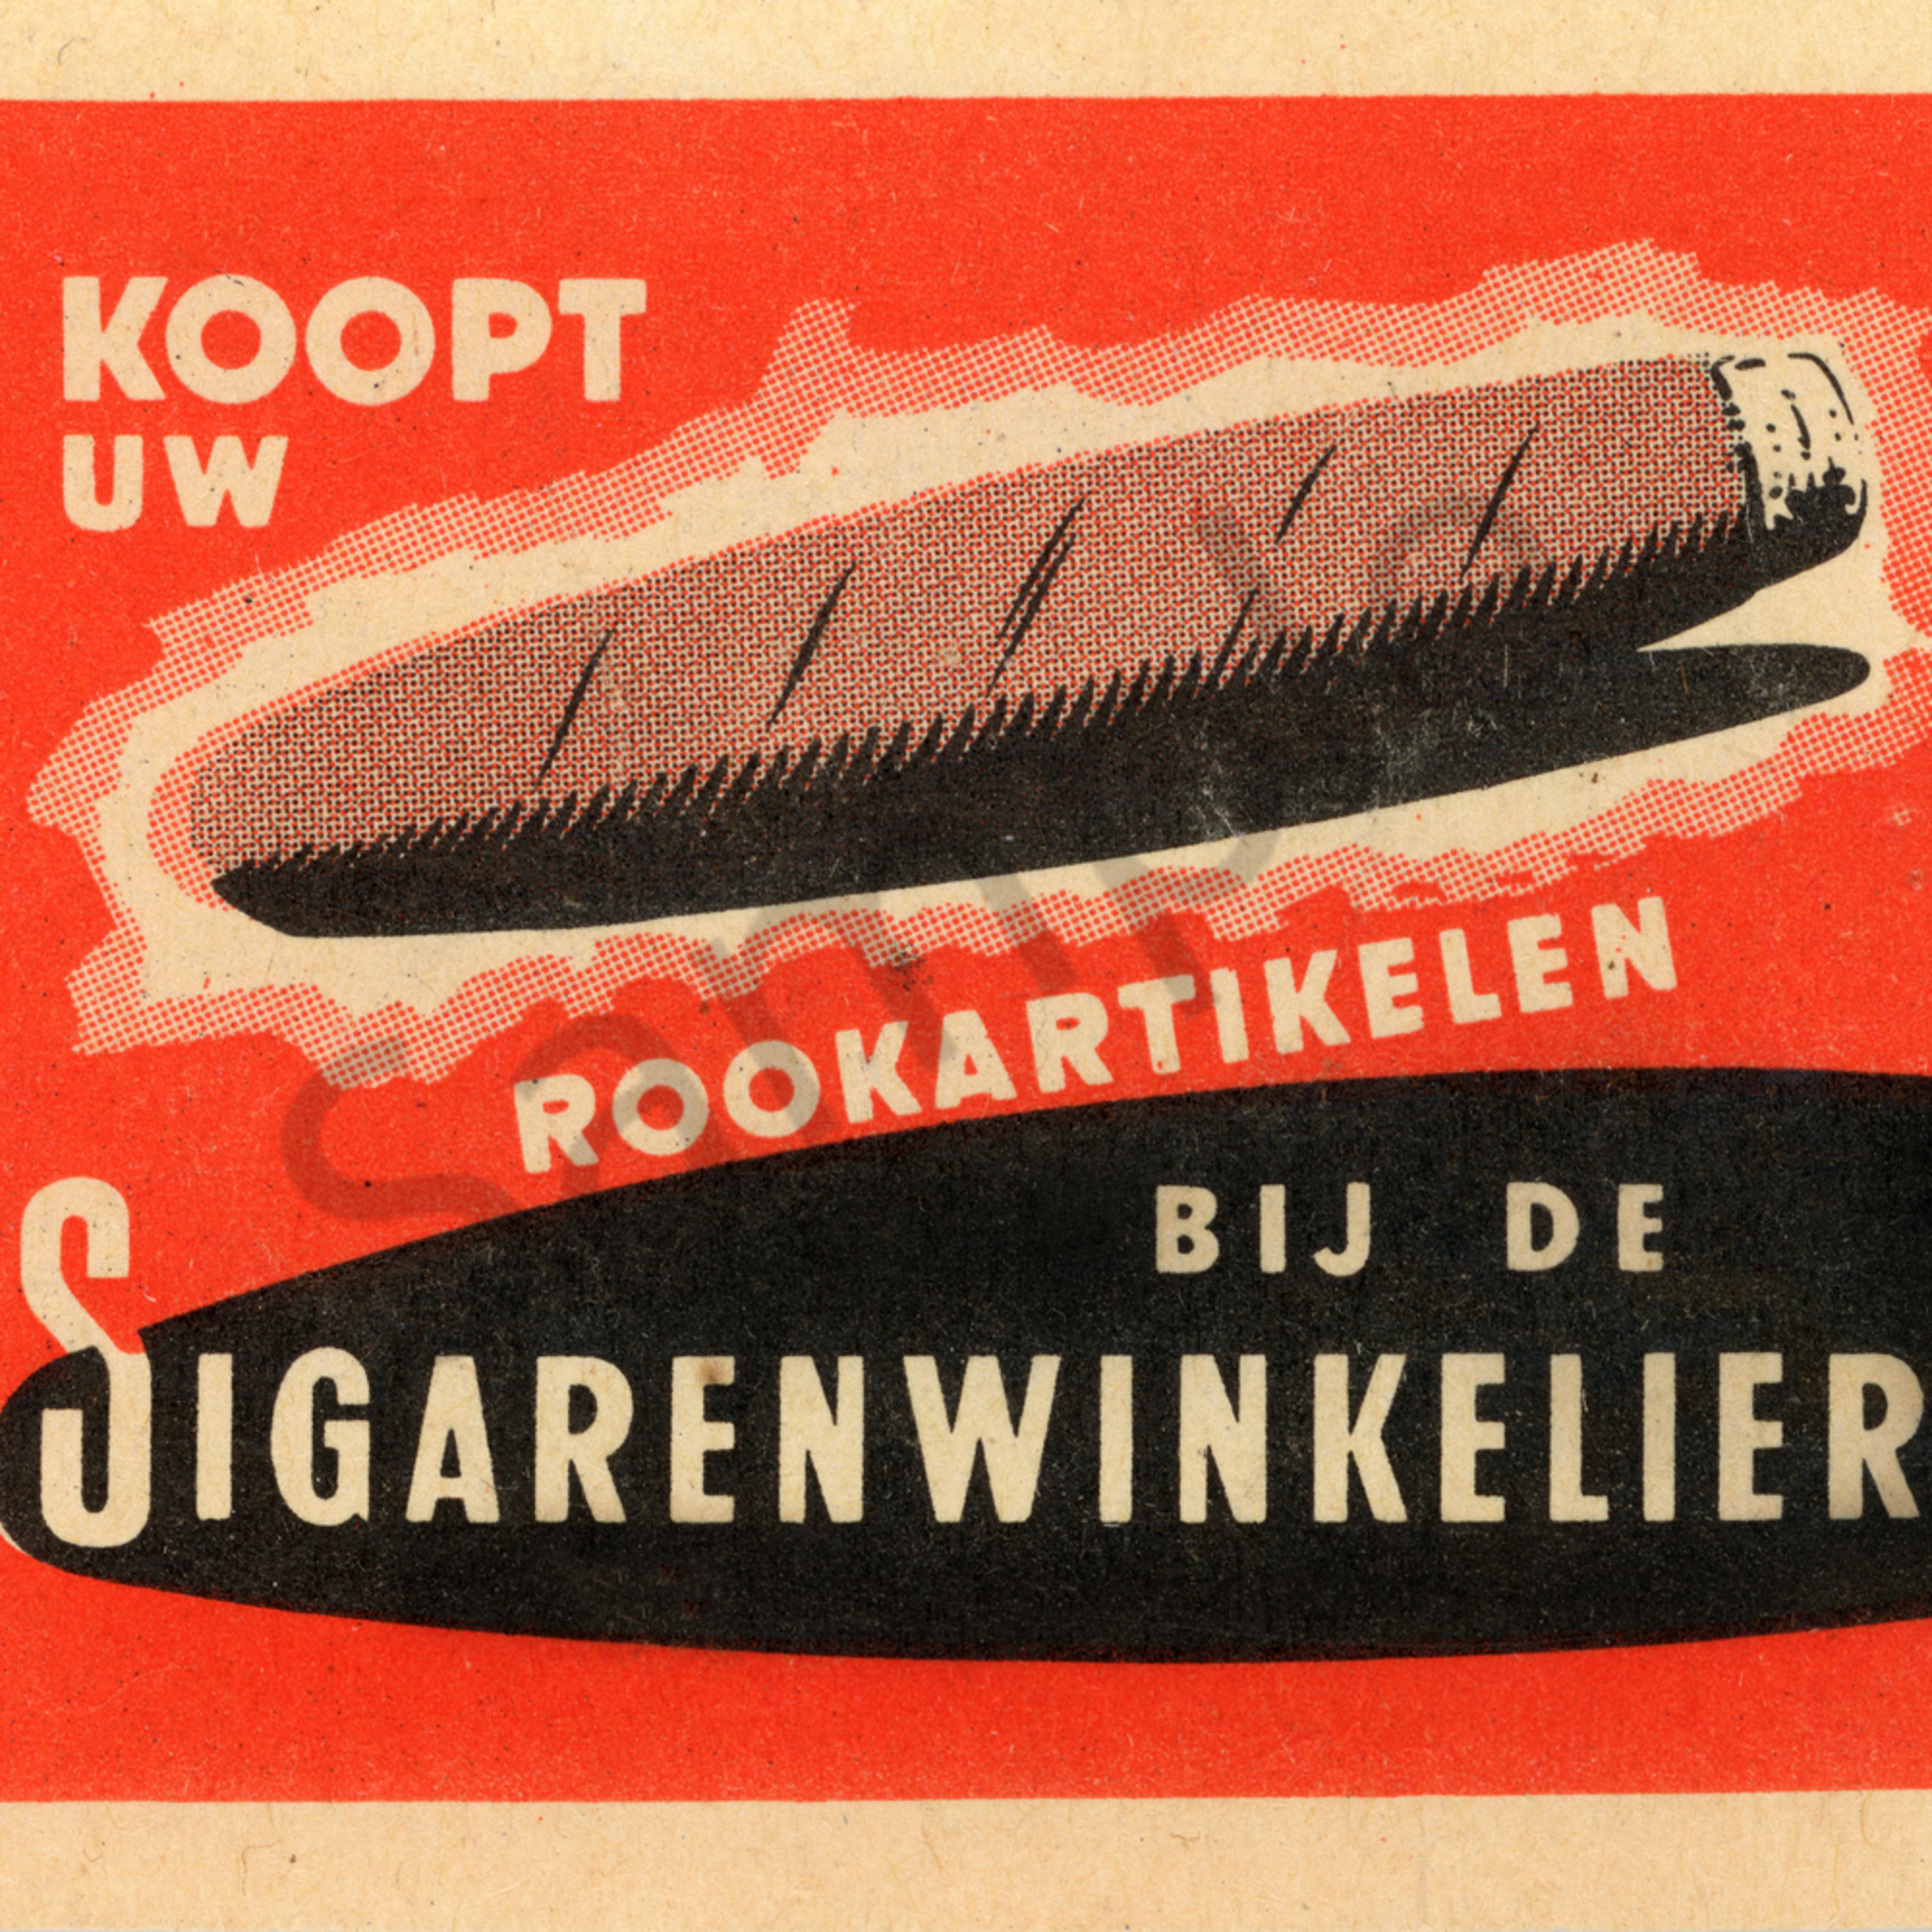 Cigar rndxpz